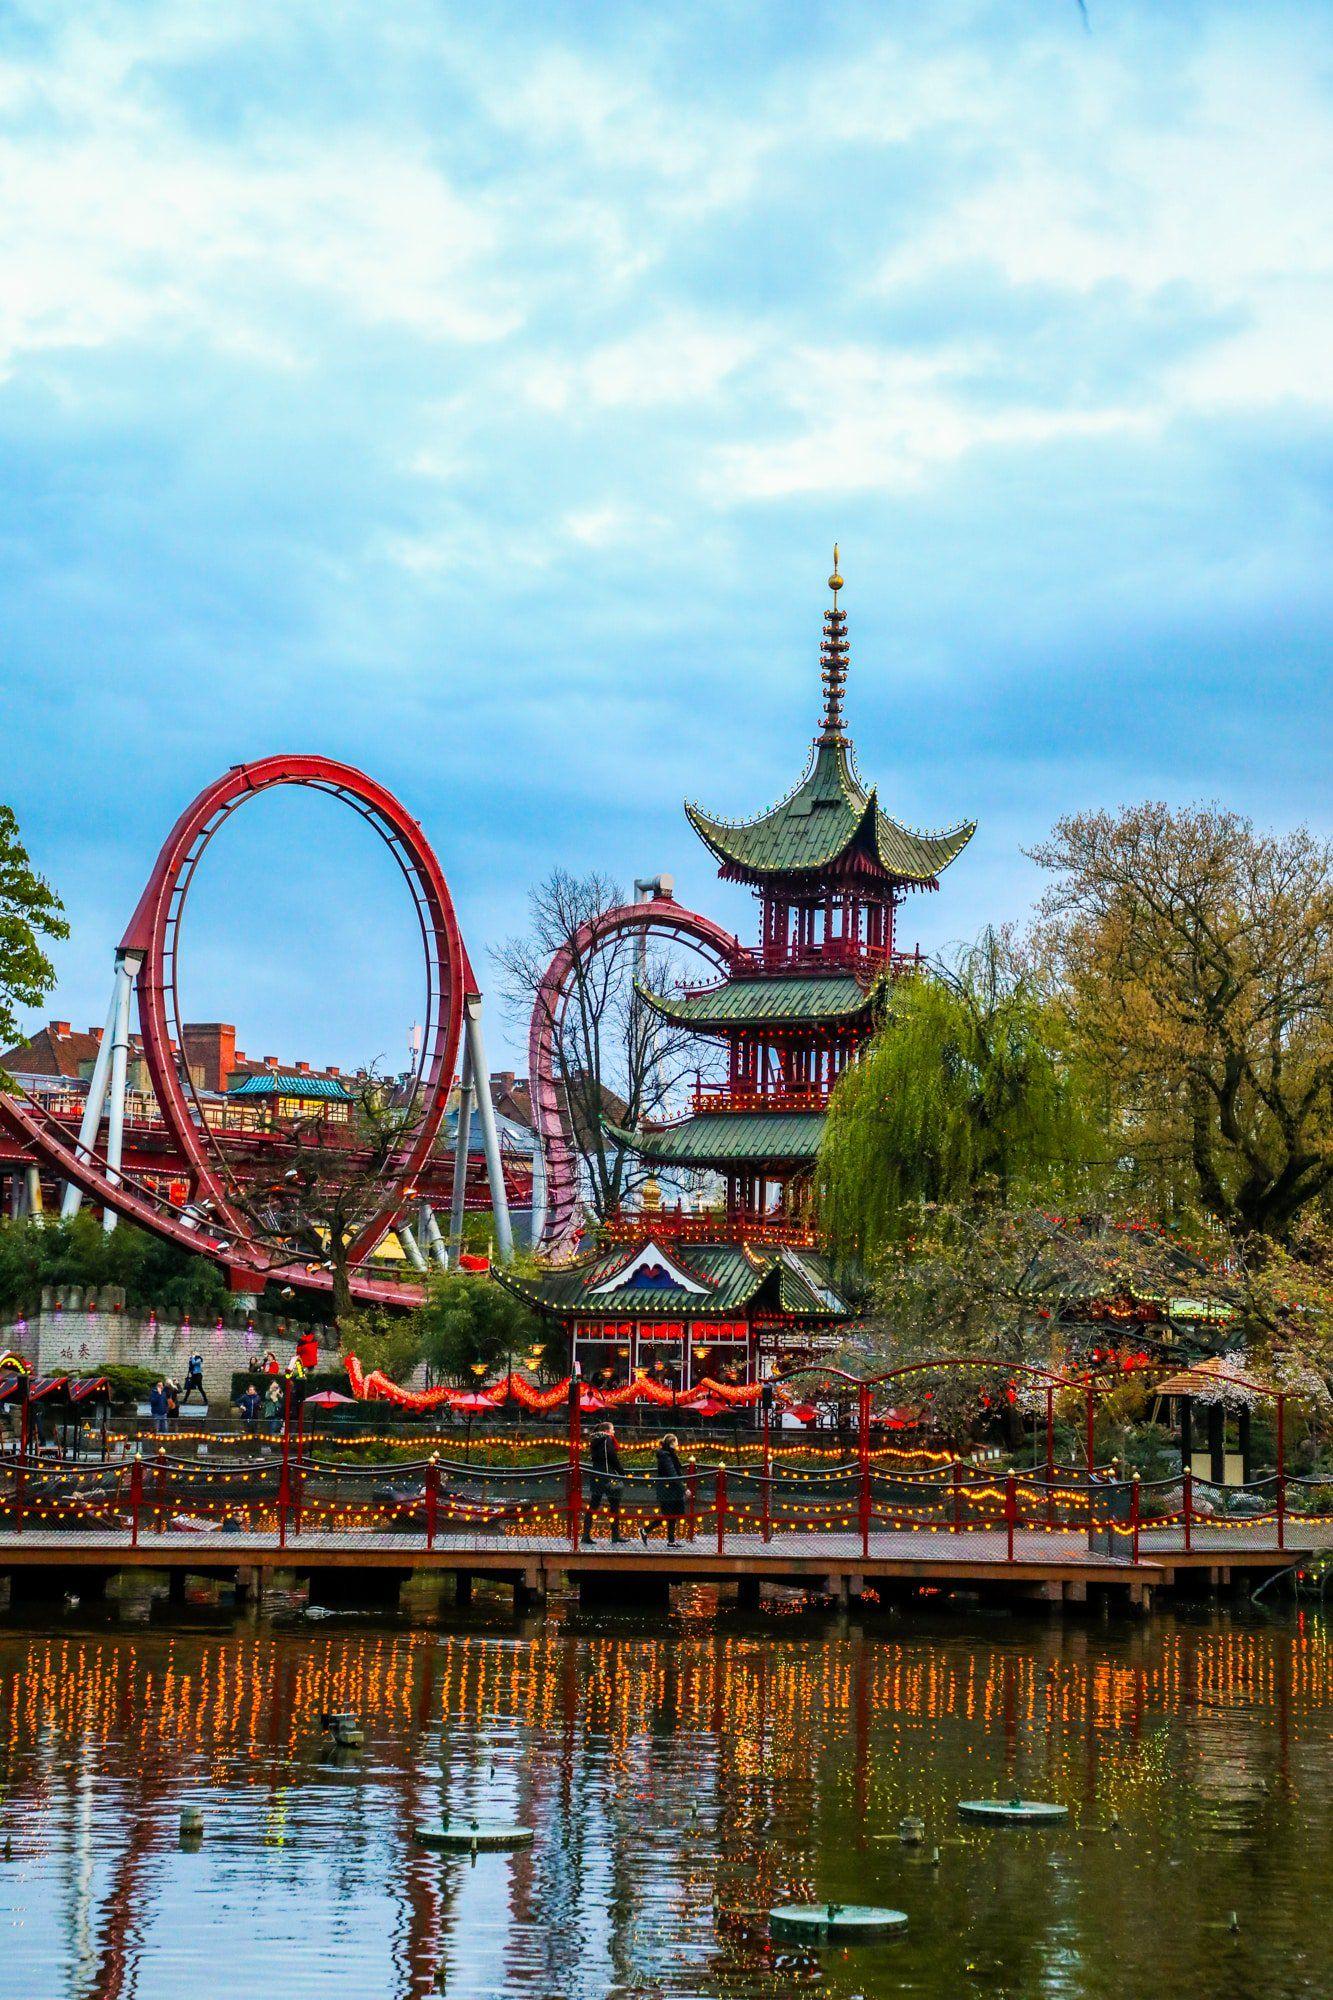 740820101ad4f5c3d0df1aeeba501c4a - What Is Tivoli Gardens Like Today